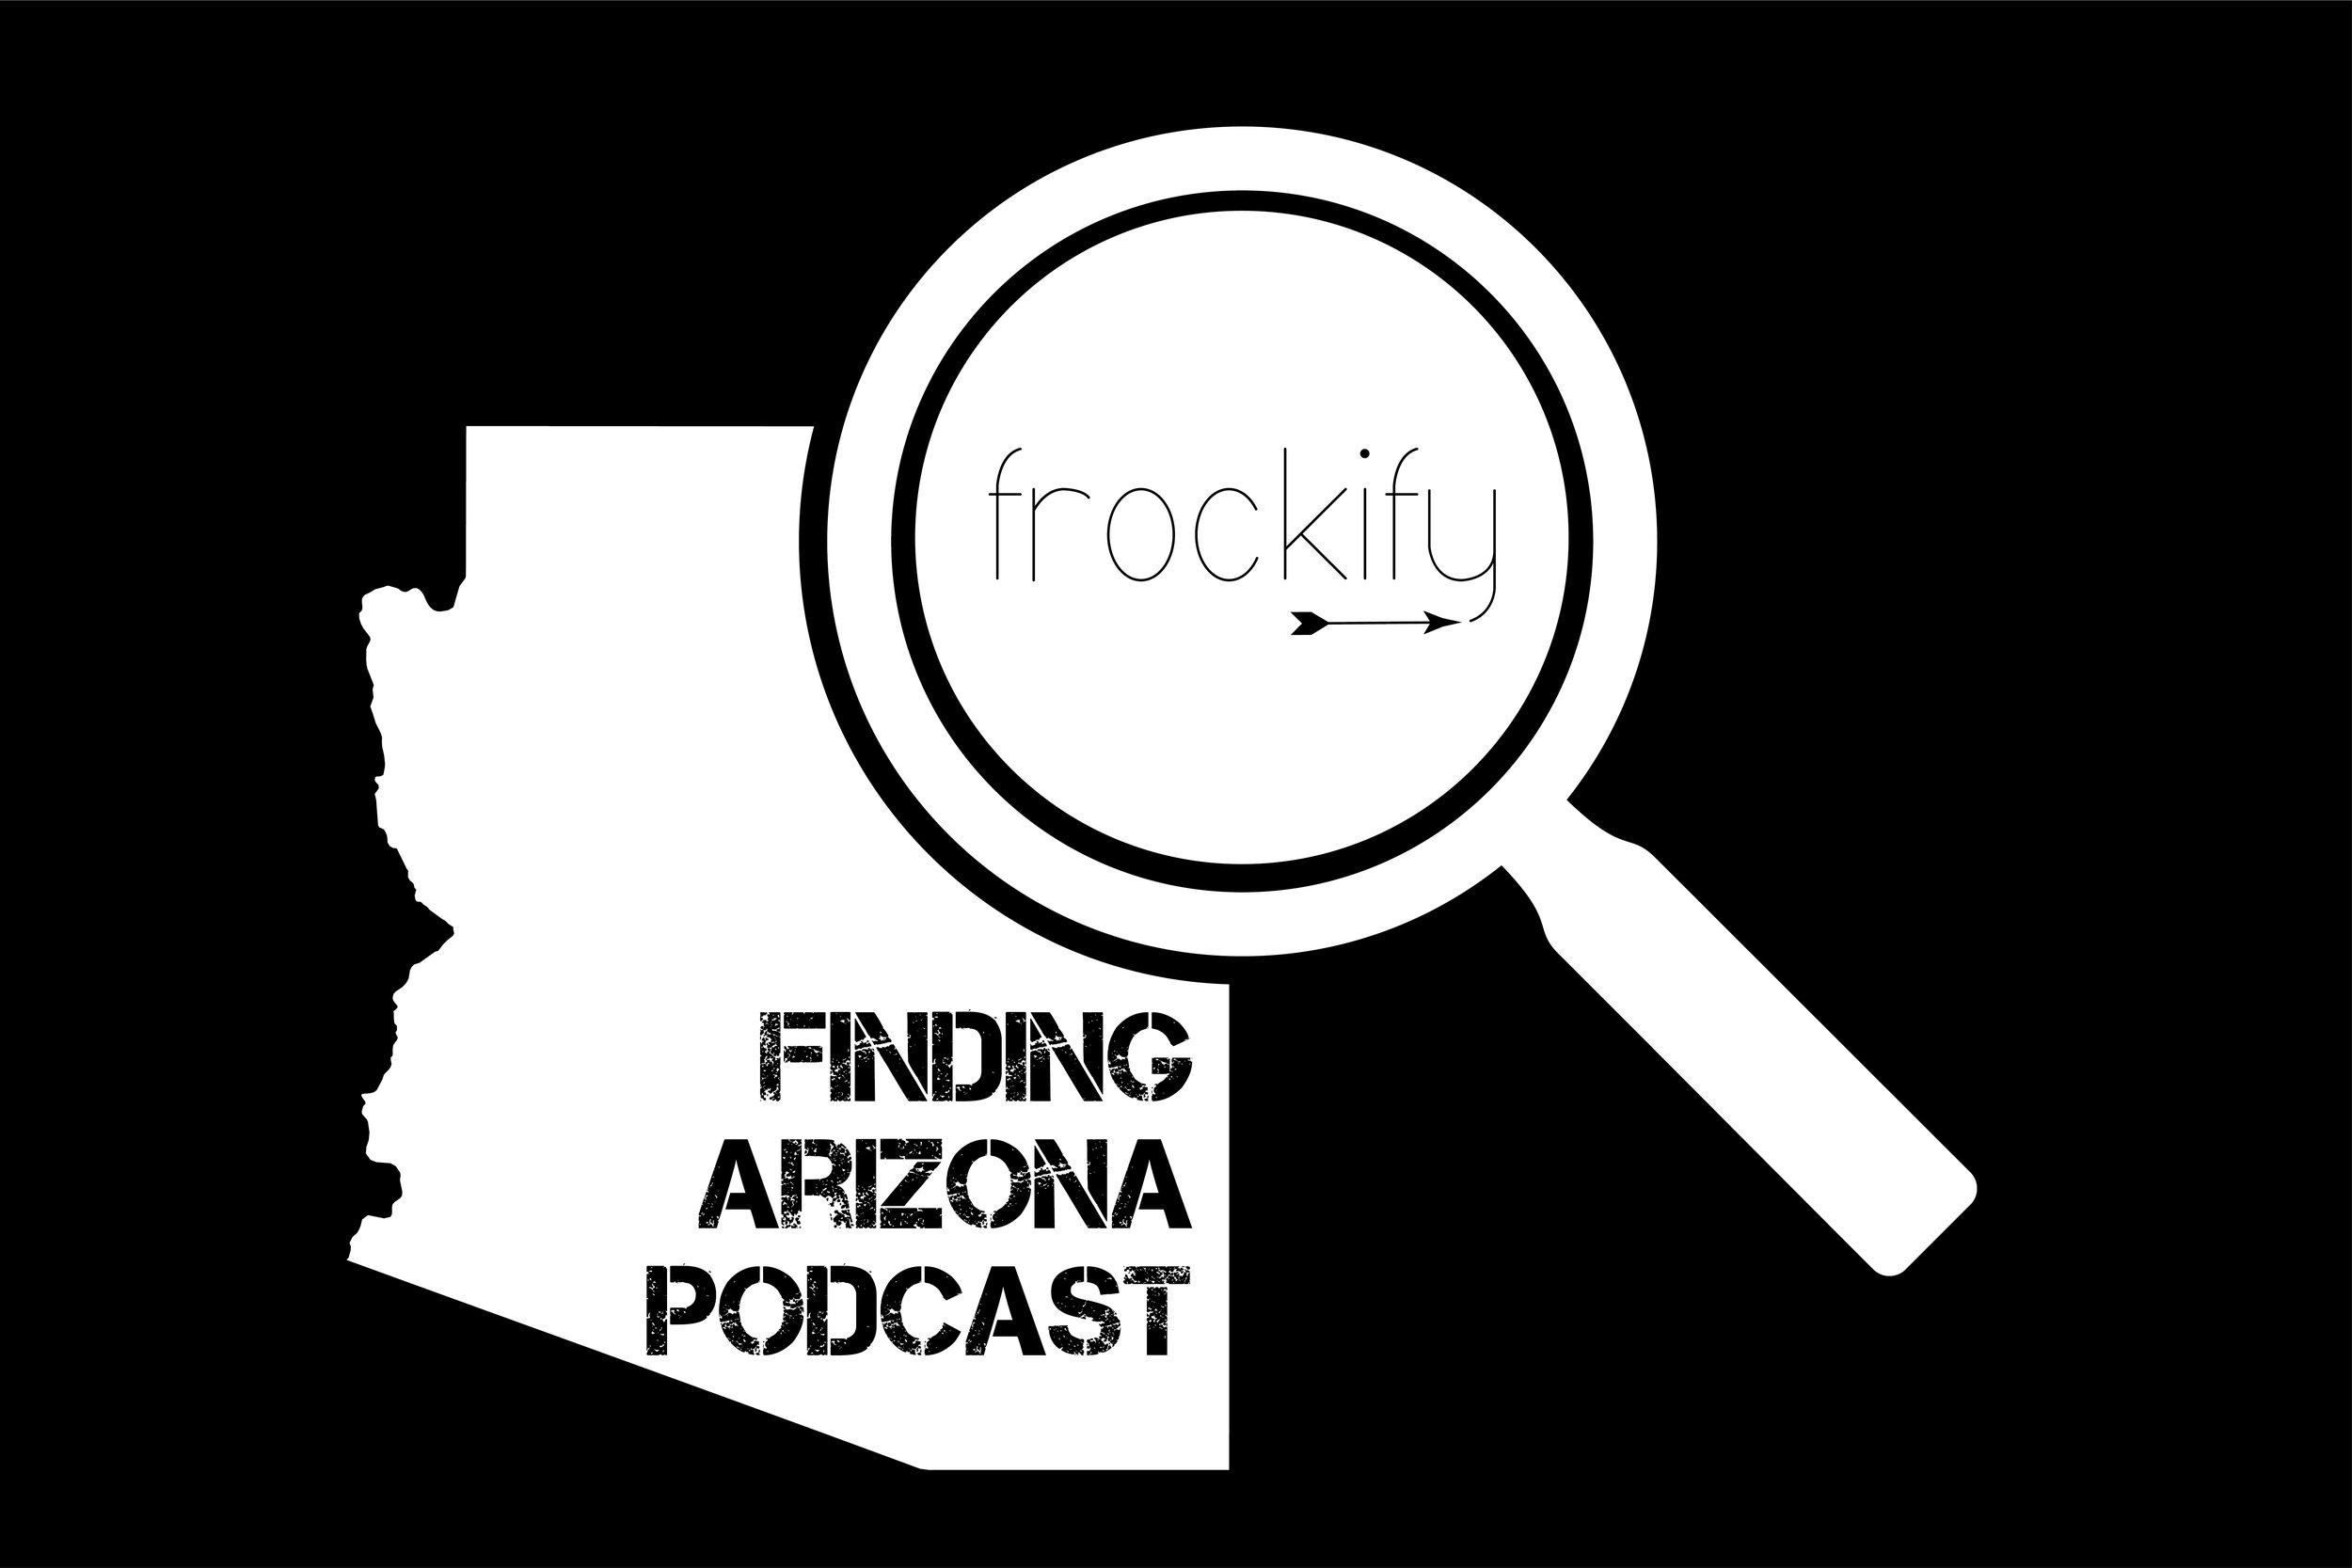 PodCastLogo-Frockify-06.jpg